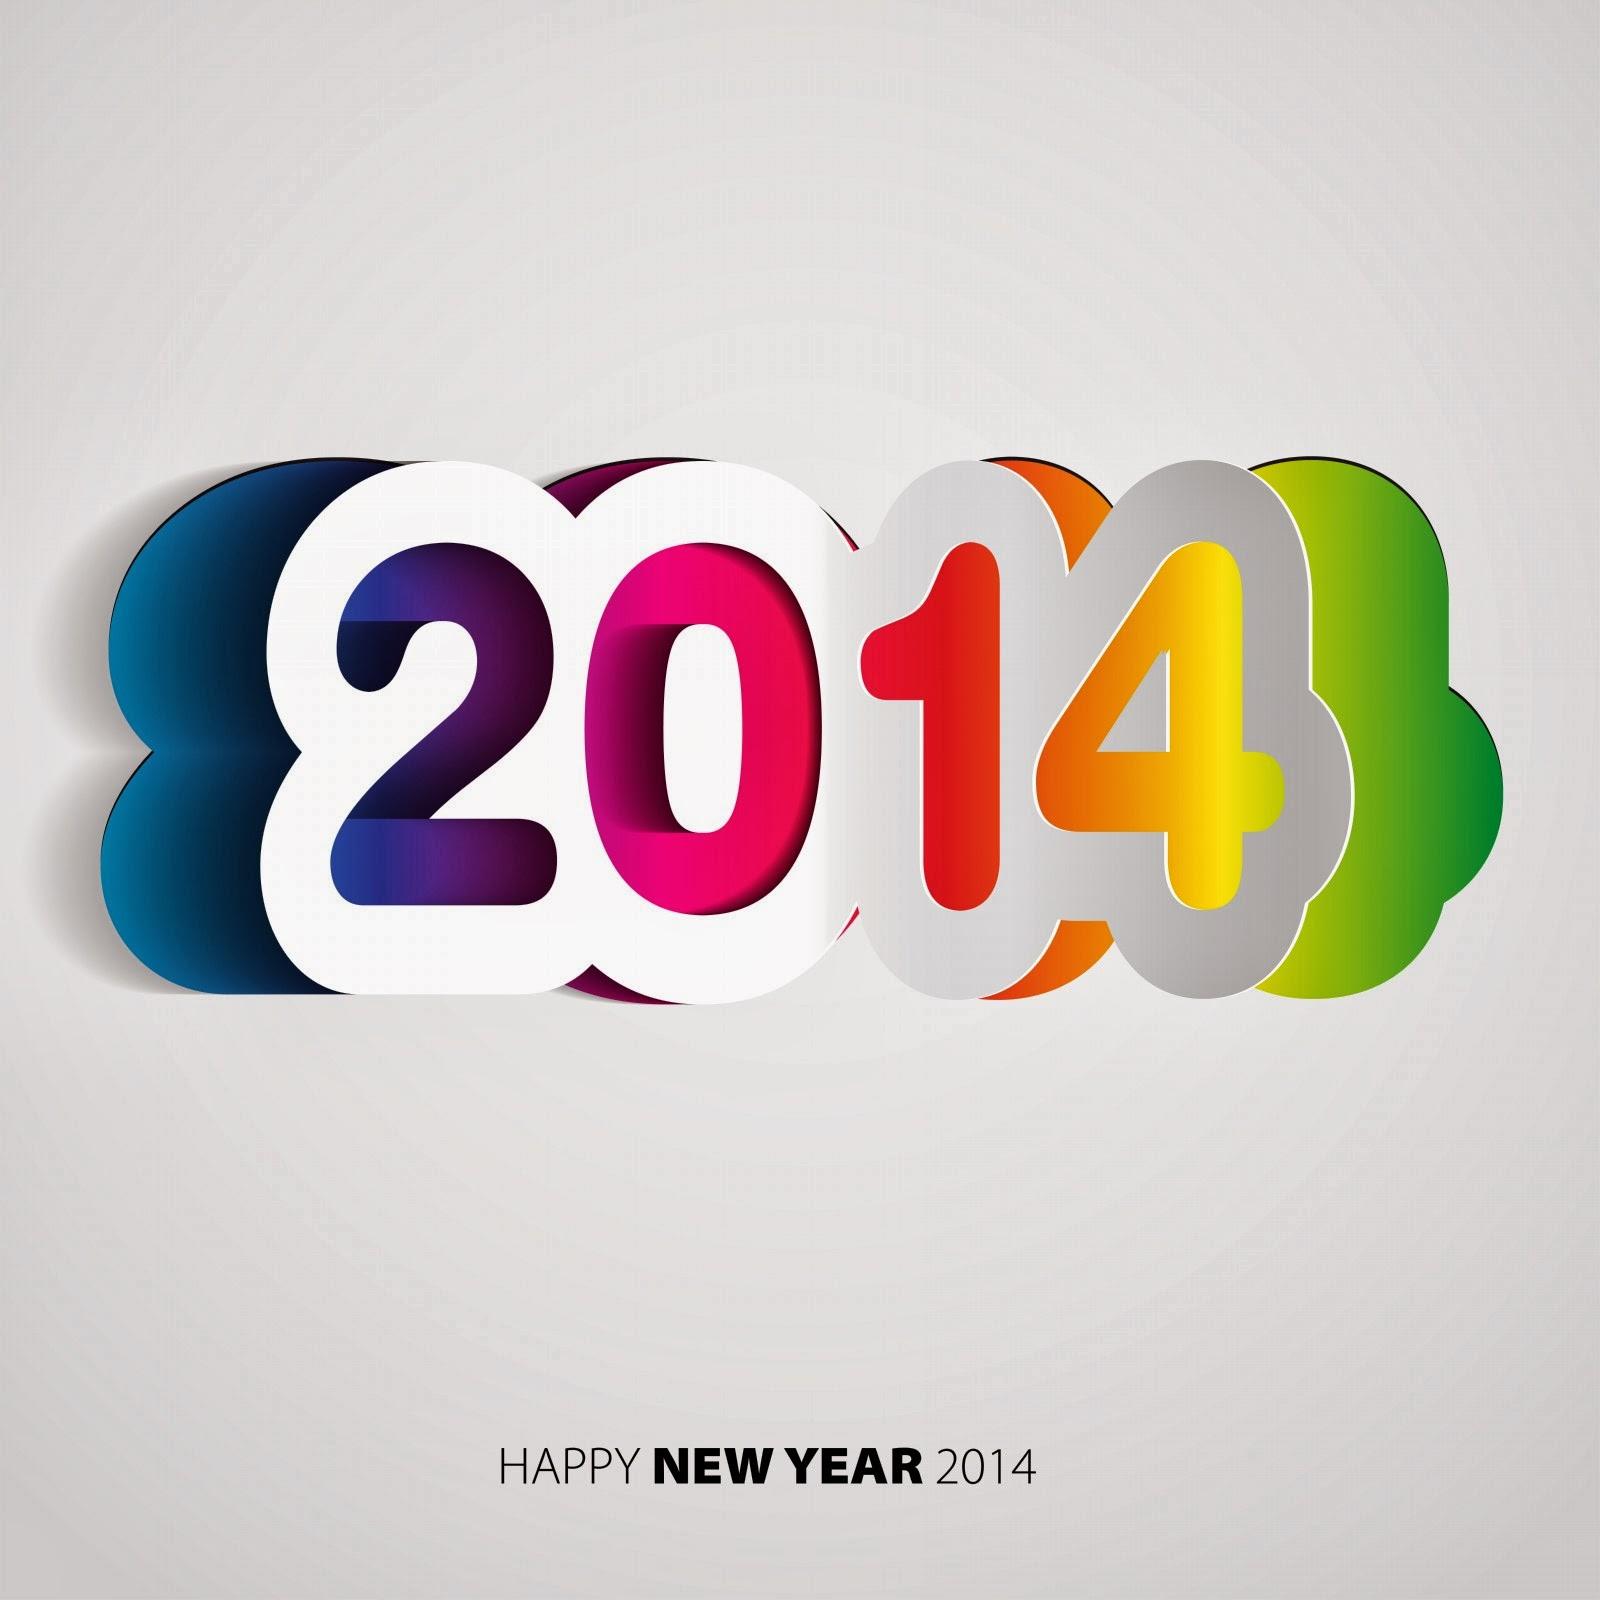 Amazing 2014 Text Designs Happy New Year